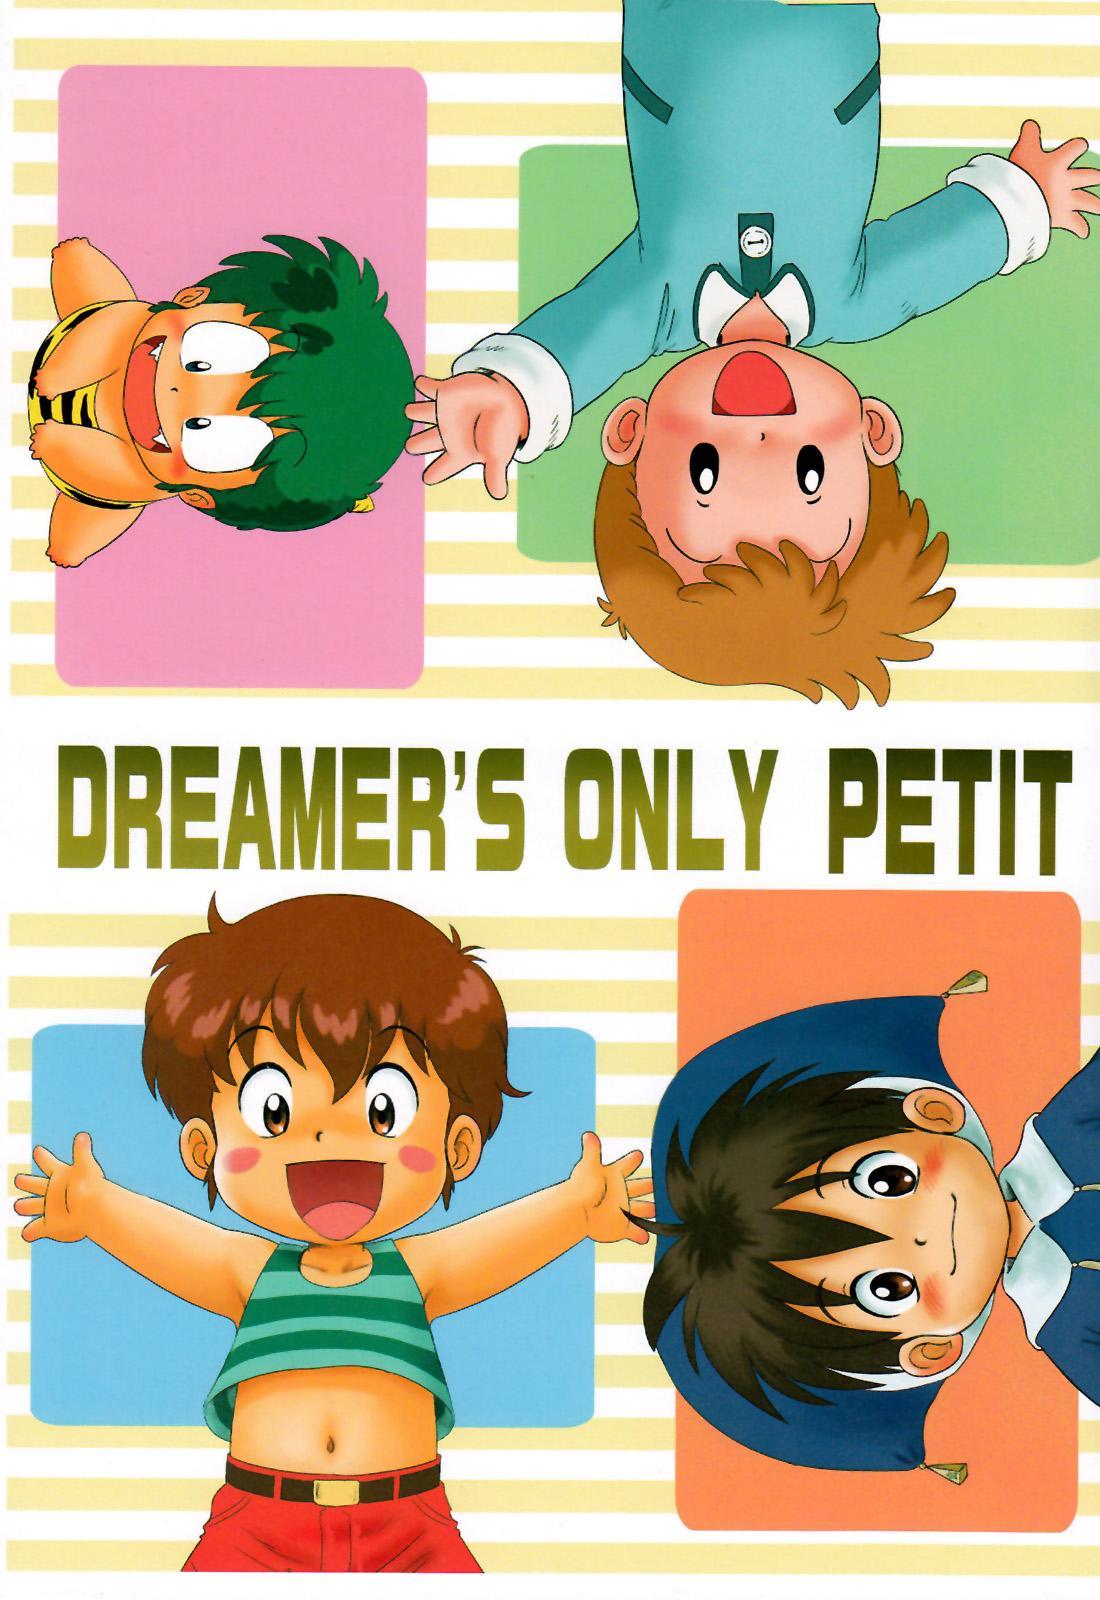 Mitsui Jun (Sennen Teikoku) - Dreamer's Only Petit (Various) 2